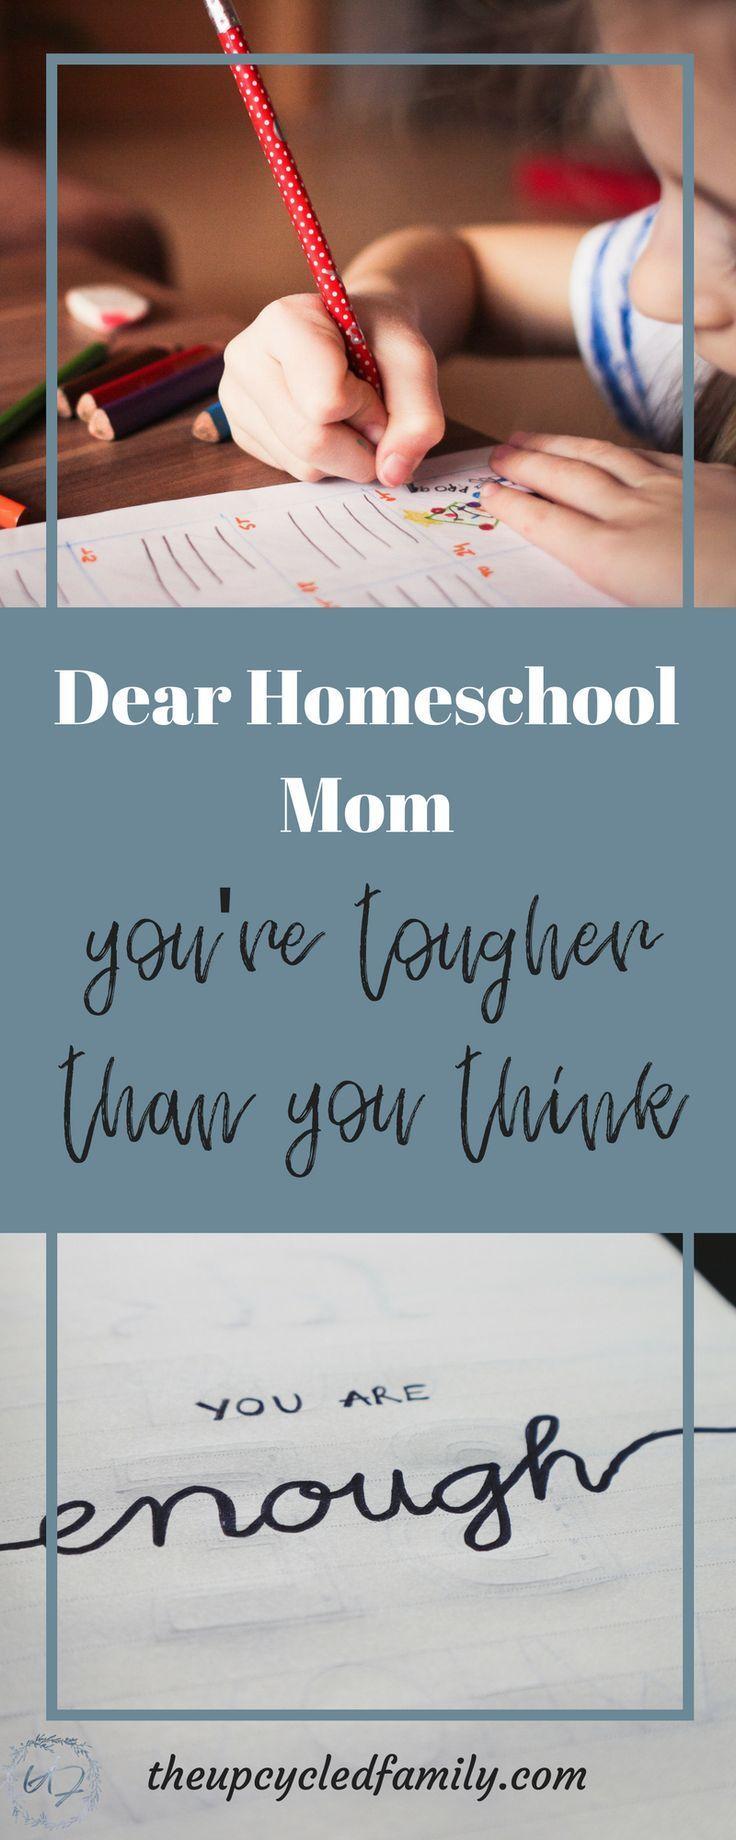 Dear Homeschool Mom | Homeschool